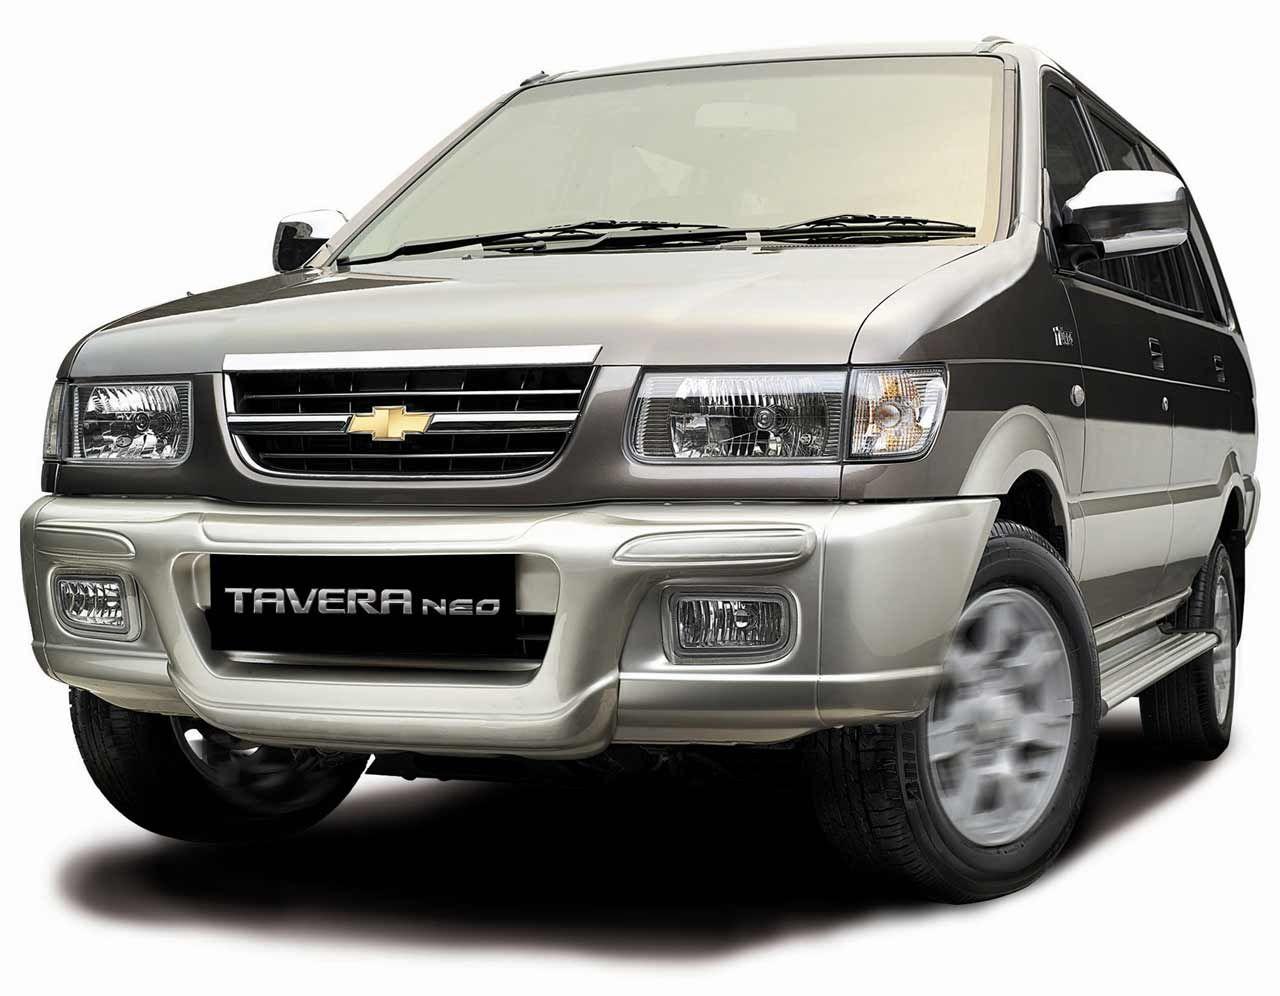 Chevrolet Tavera 4 Jpg 1280 996